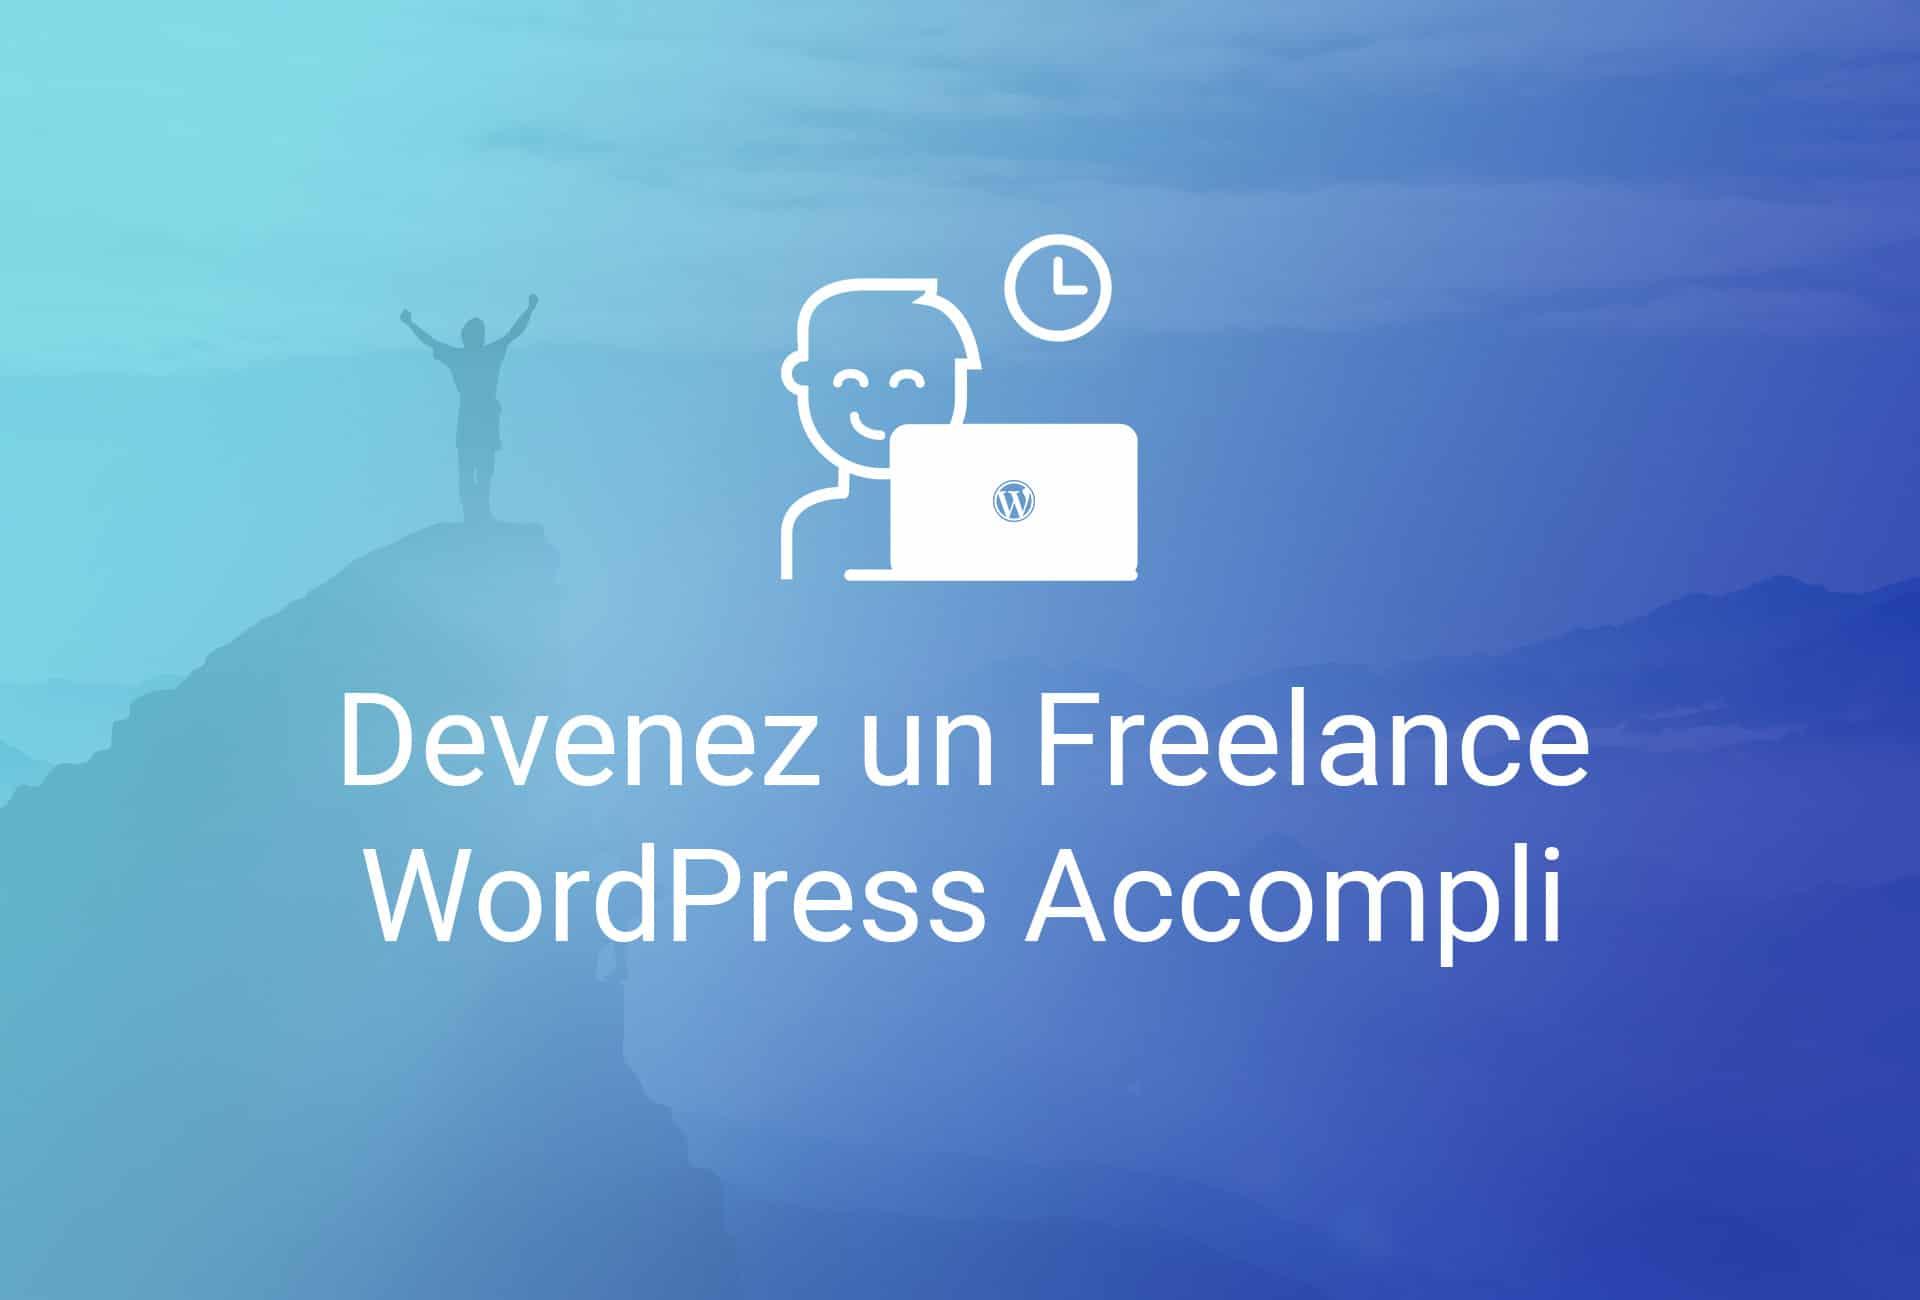 Devenez un freelance WordPress accompli